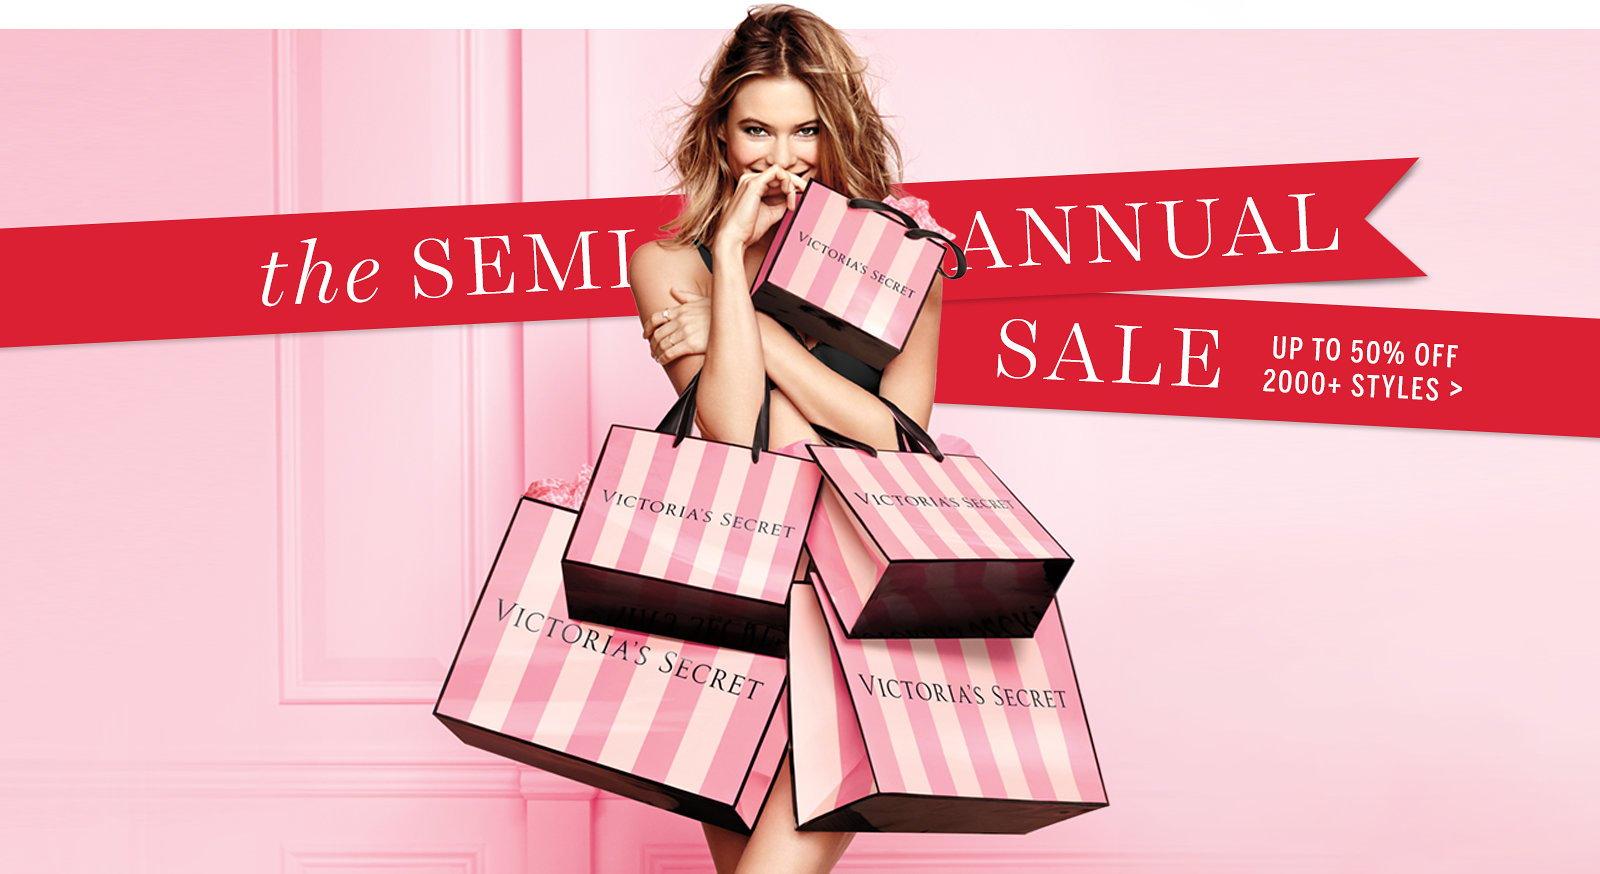 36916d0a2c1b3 Victoria s Secret Semi-Annual Sale is Underway - NerdWallet